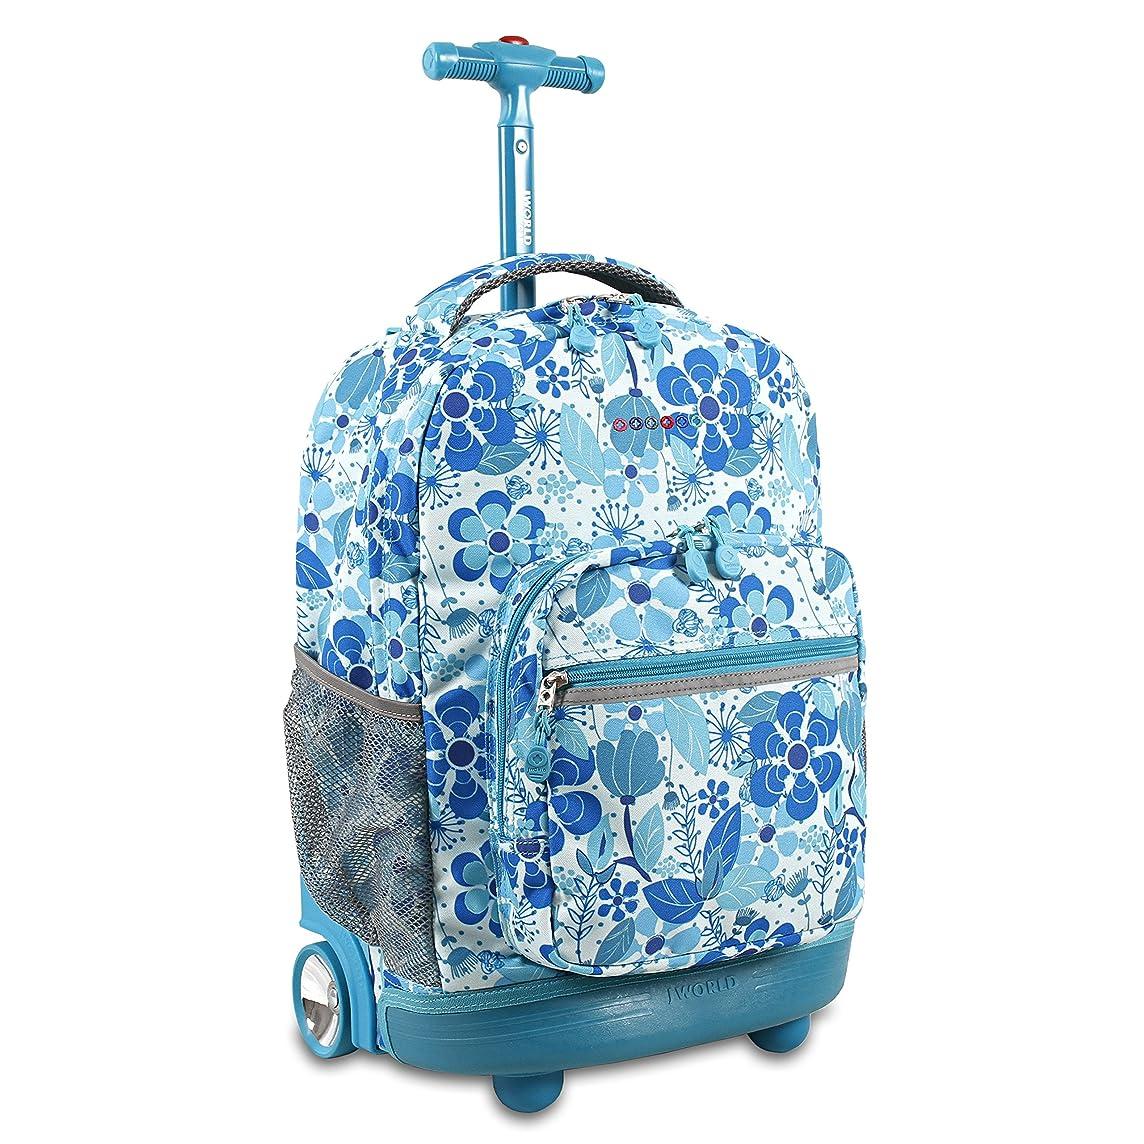 J World New York Girls' Sunrise Rolling Backpack Fashion, Blue Vine, One Size